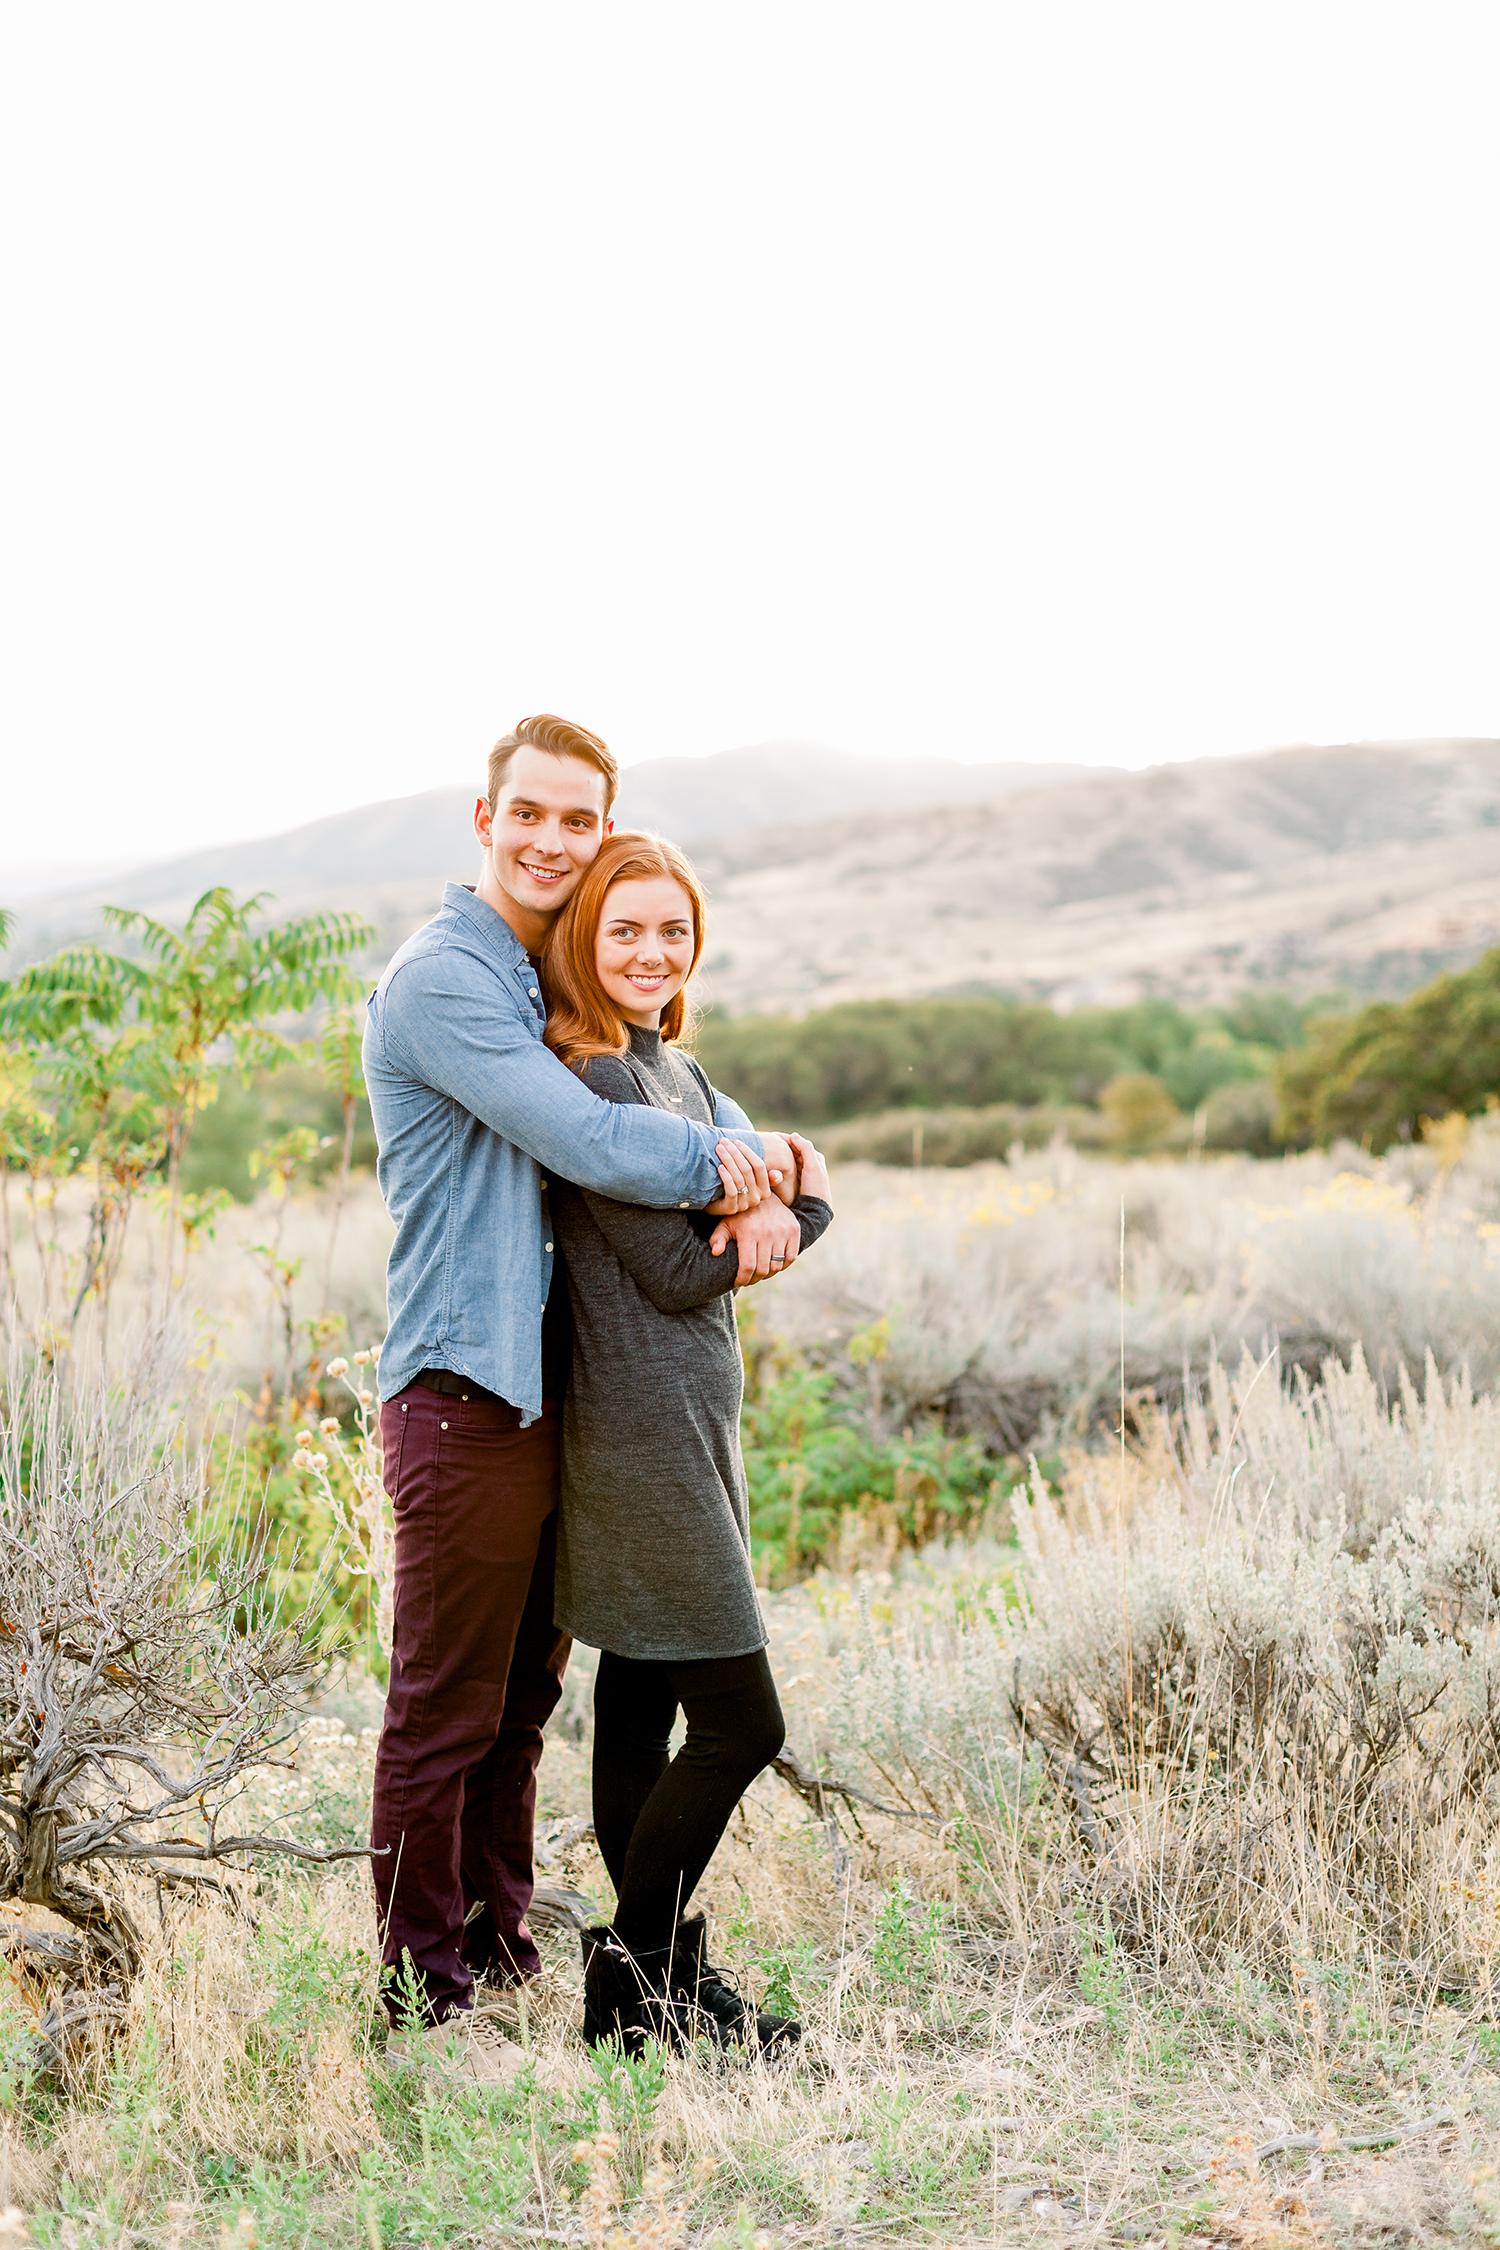 Heather Smith Photography | Utah Engagement Photographer | Utah Couples Session | Alpine Engagement Session